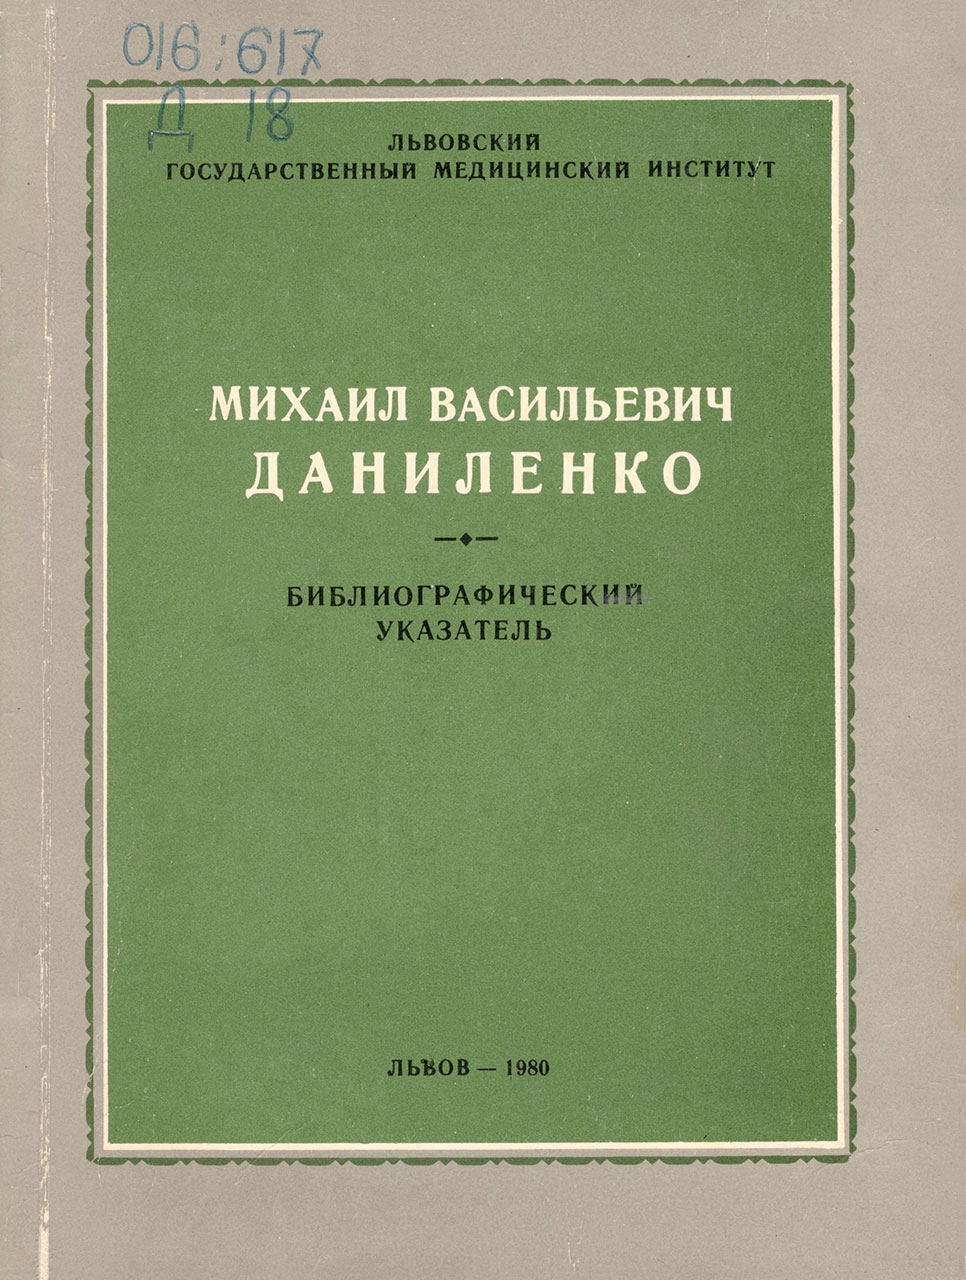 Михаил Васильевич Даниленко: библиогр. указ.